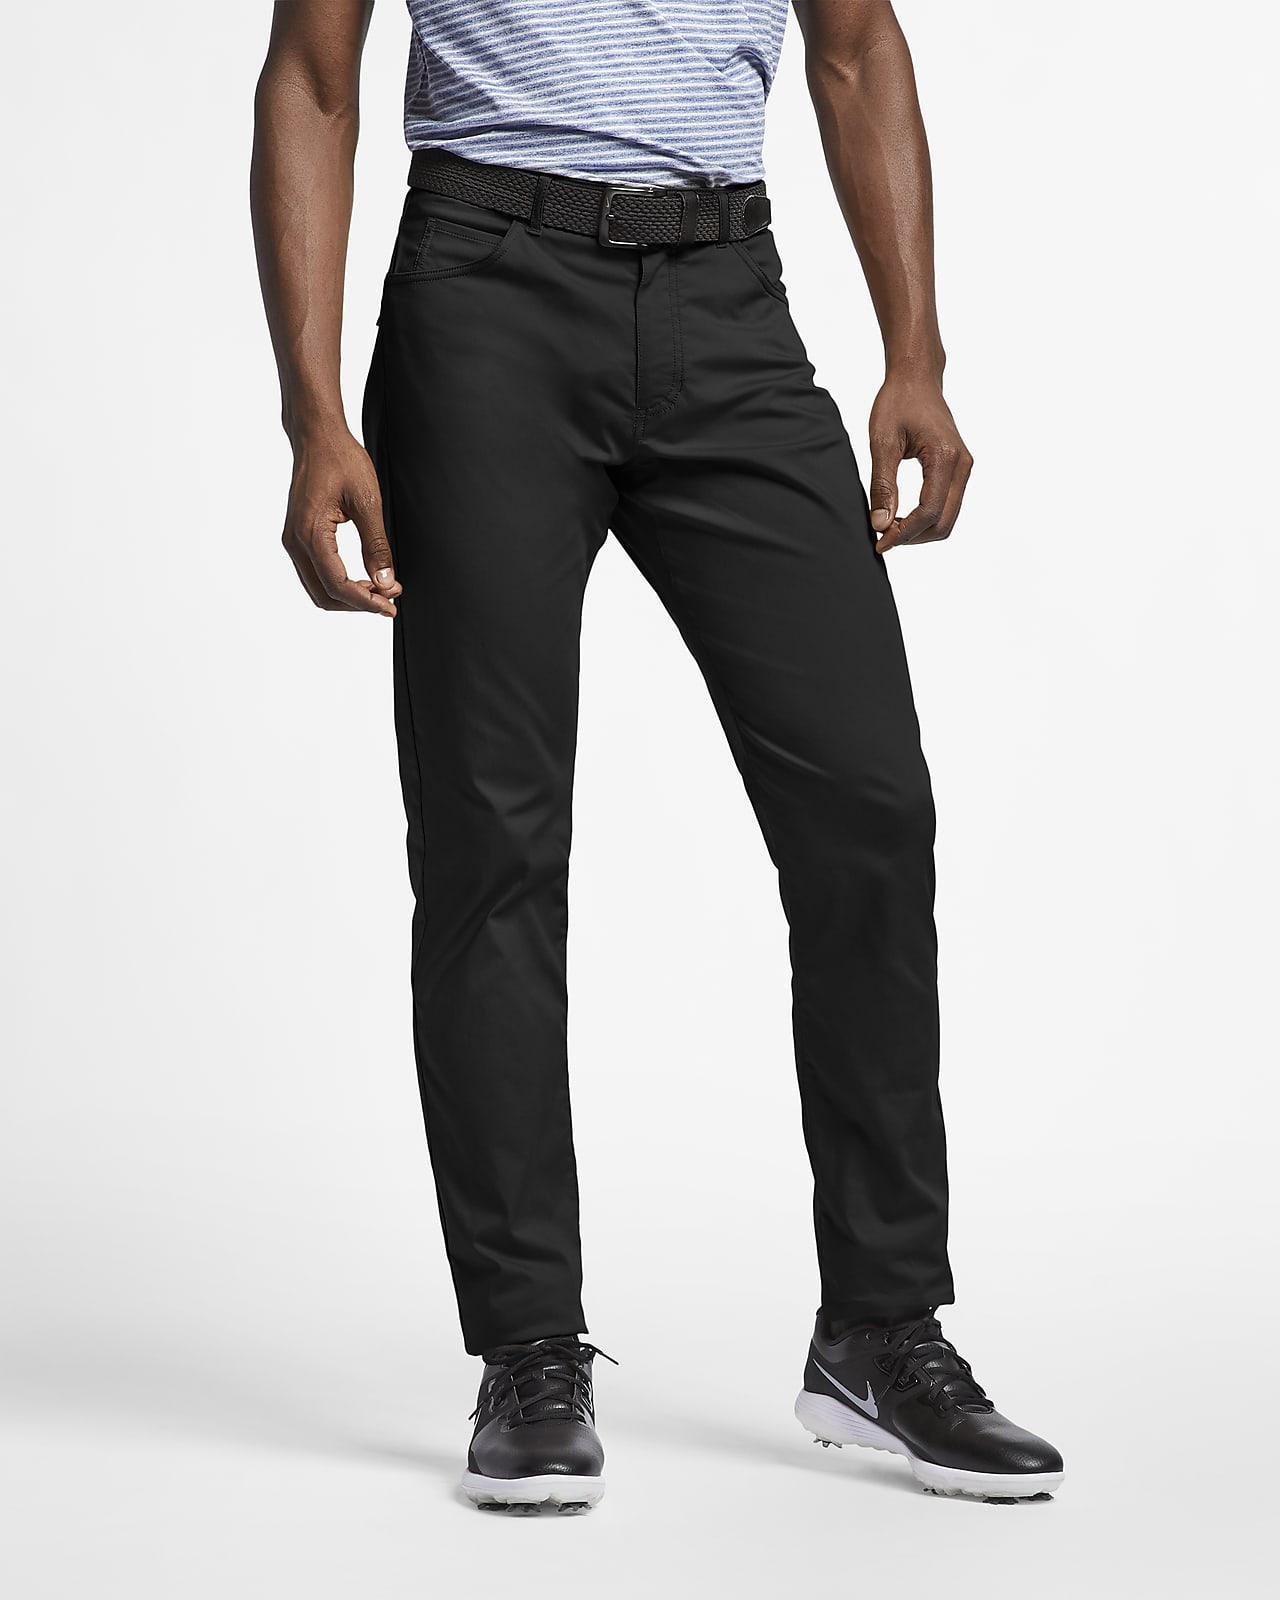 Nike Flex 5-Pocket Men's Slim-Fit Golf Pants